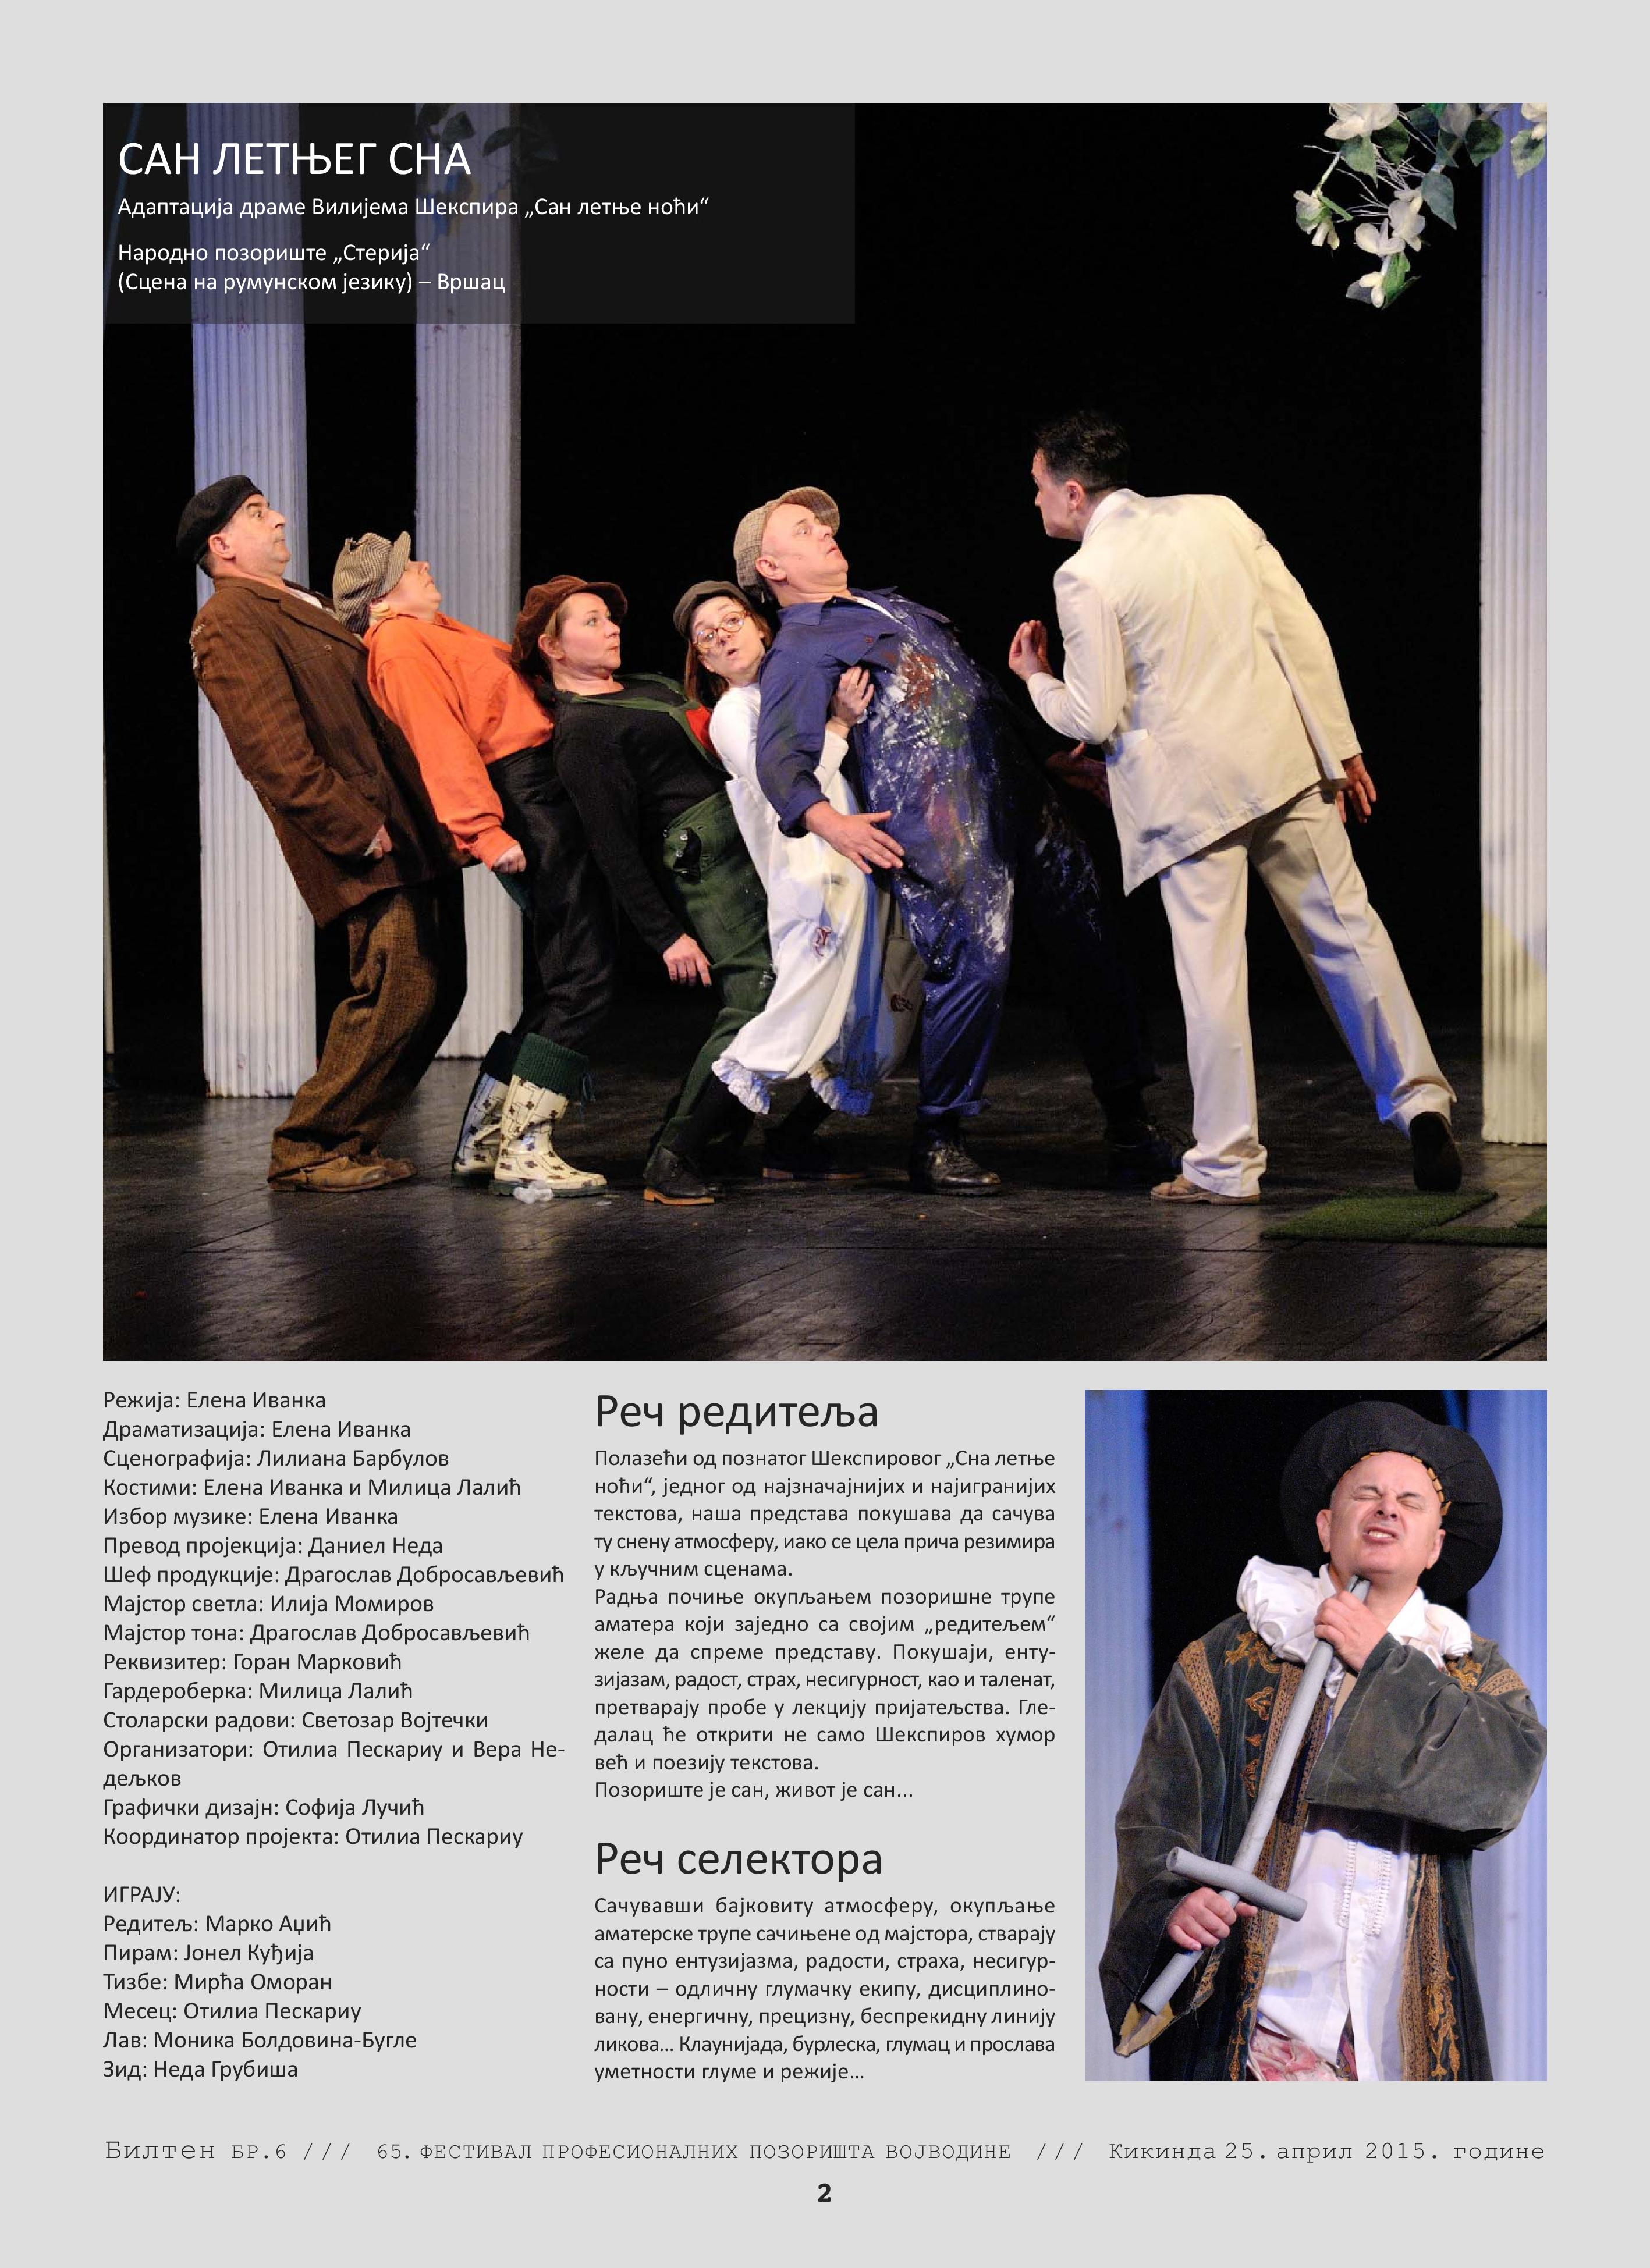 BILTEN_06_25 april-page-002